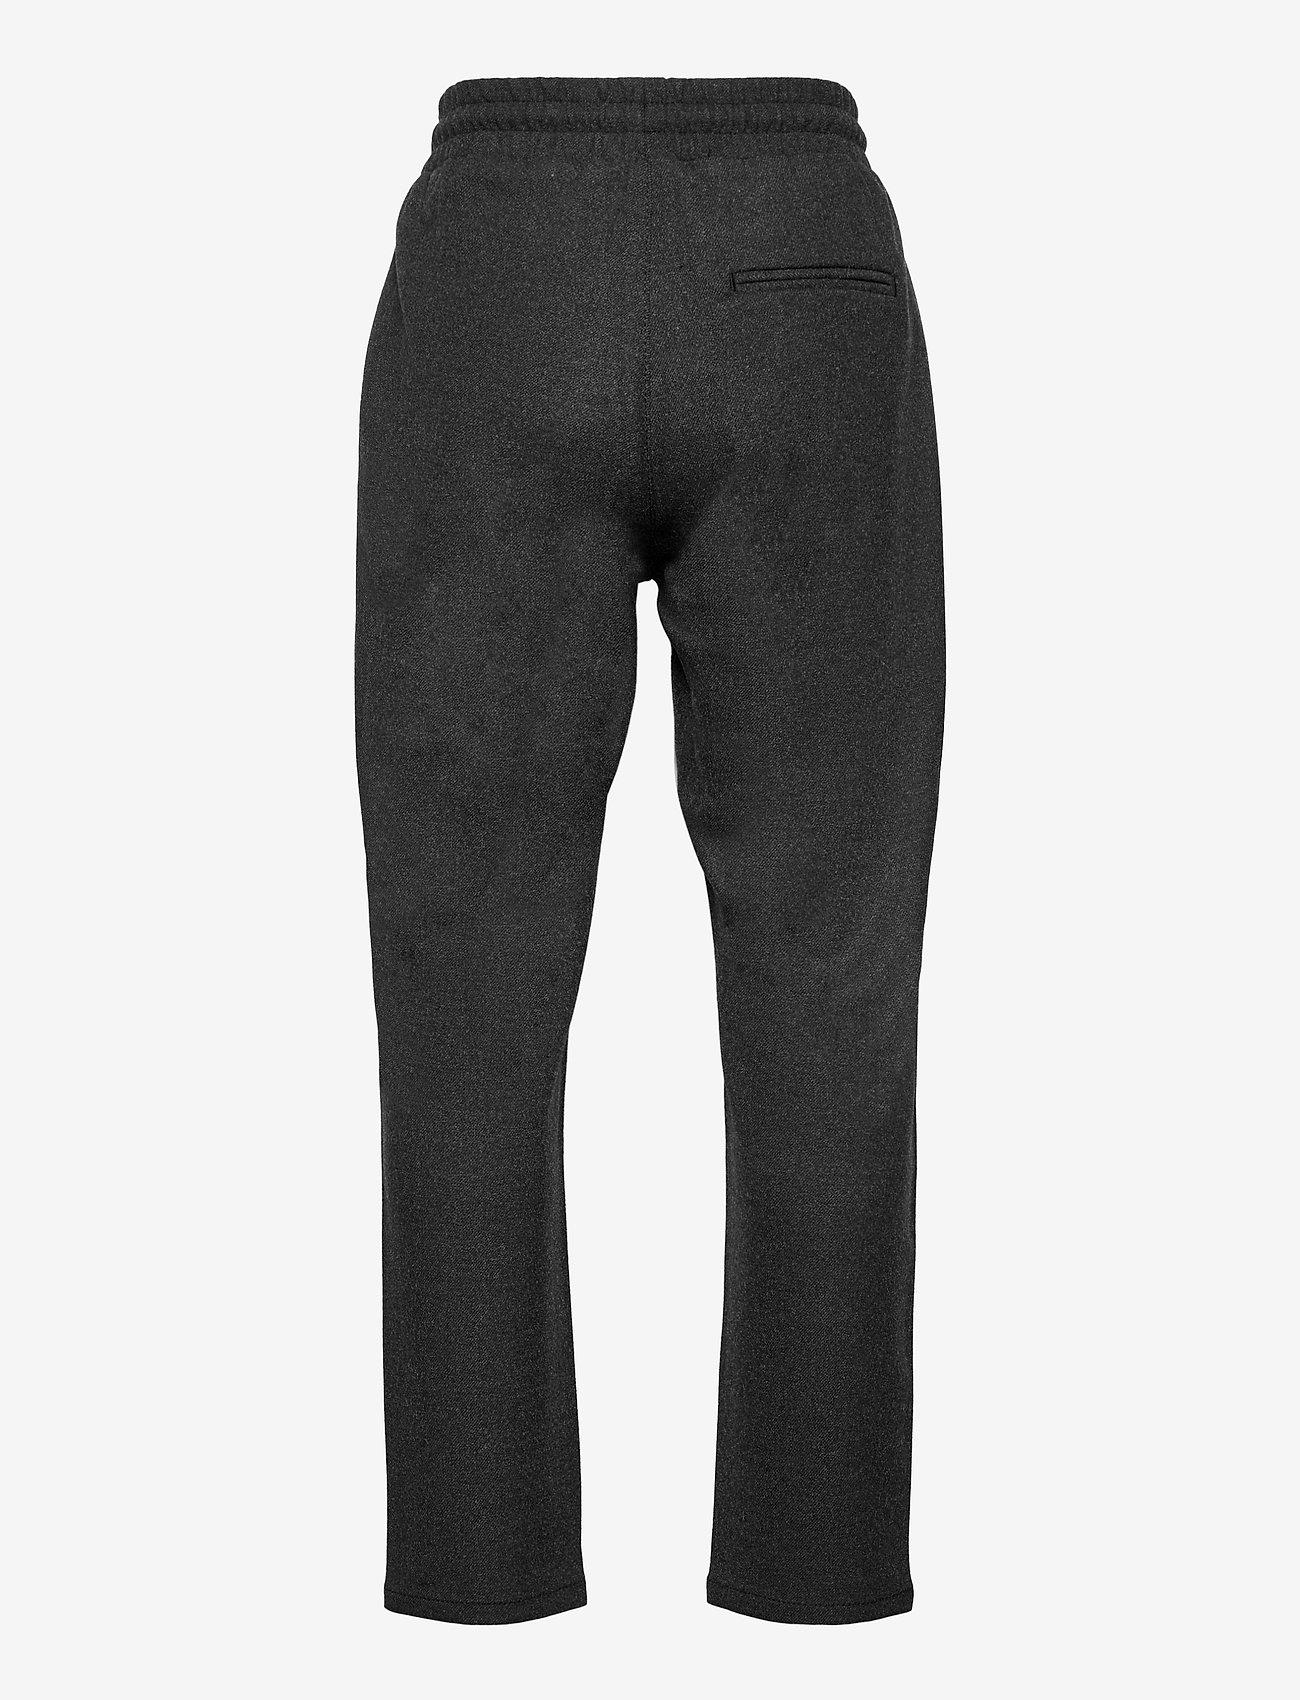 Grunt - Hack Ankle Granite - trousers - granit black - 1